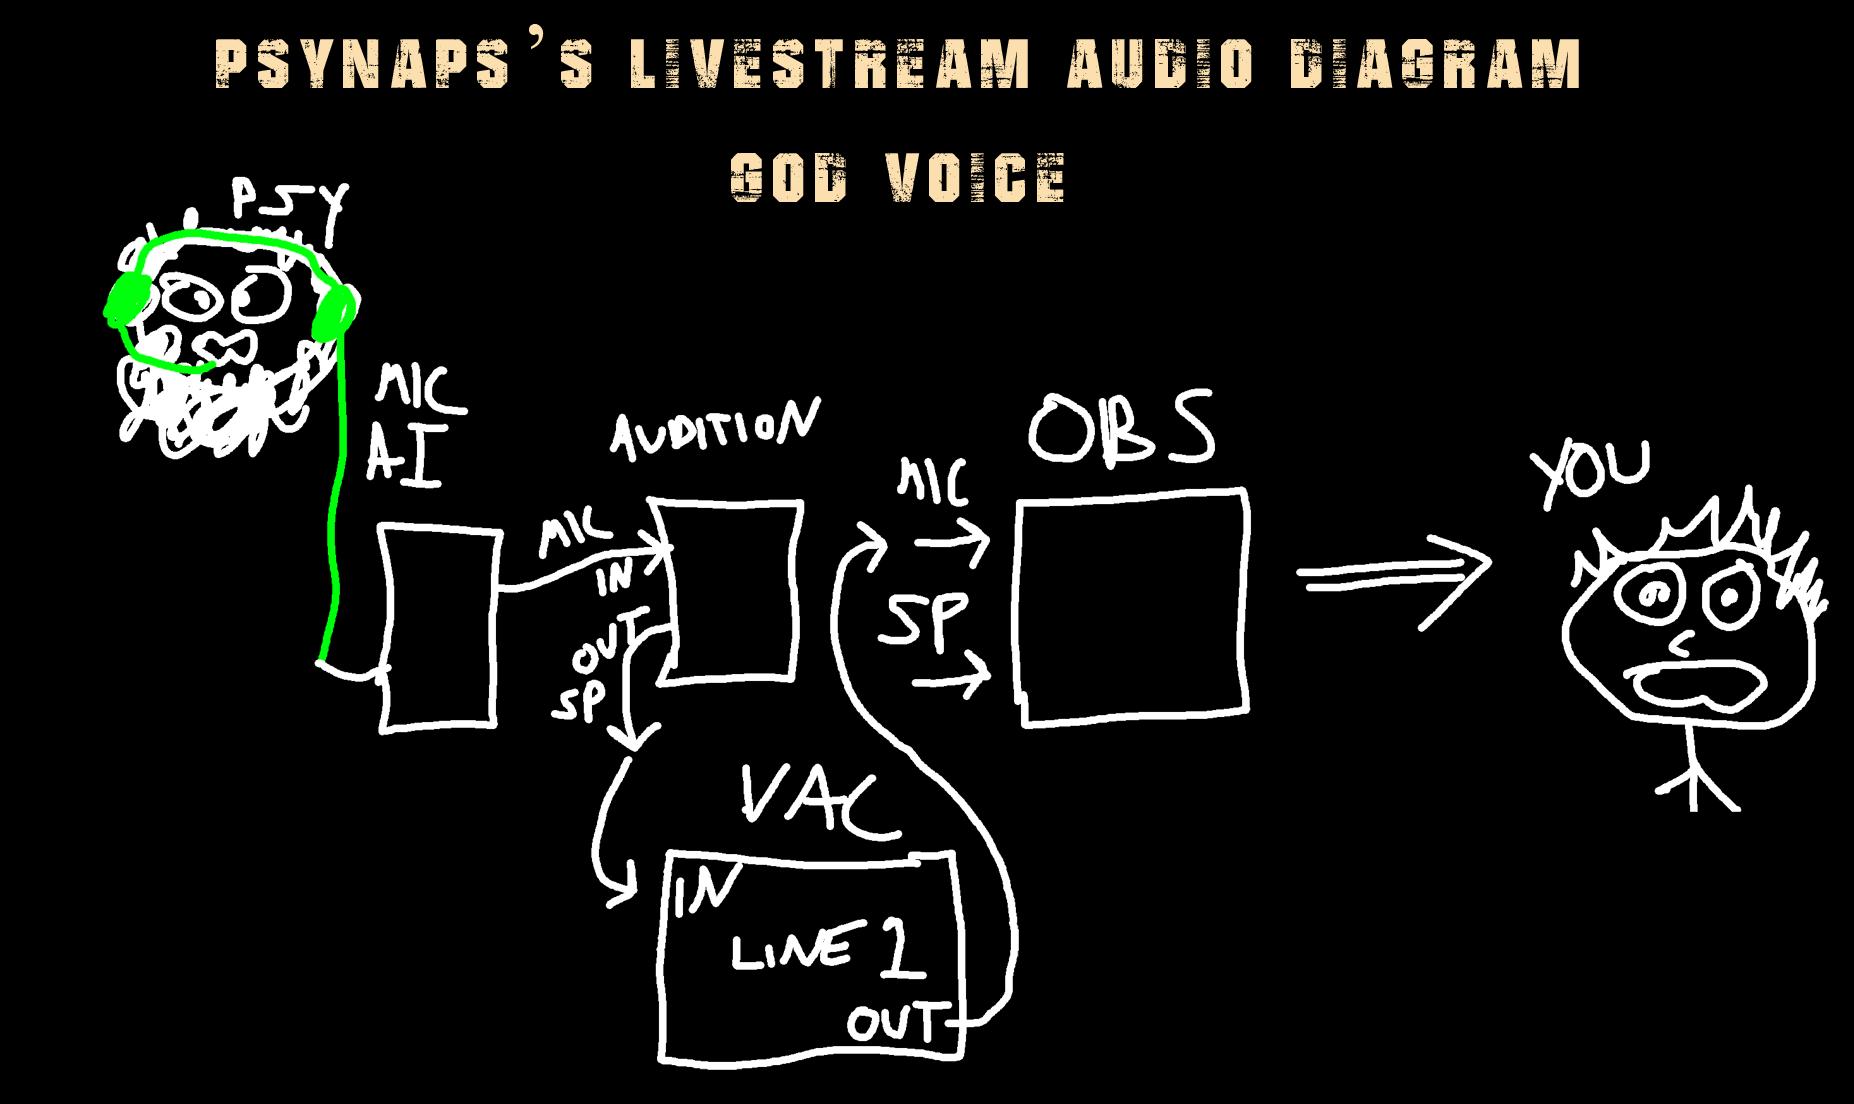 how to rewind on a live twitch stream